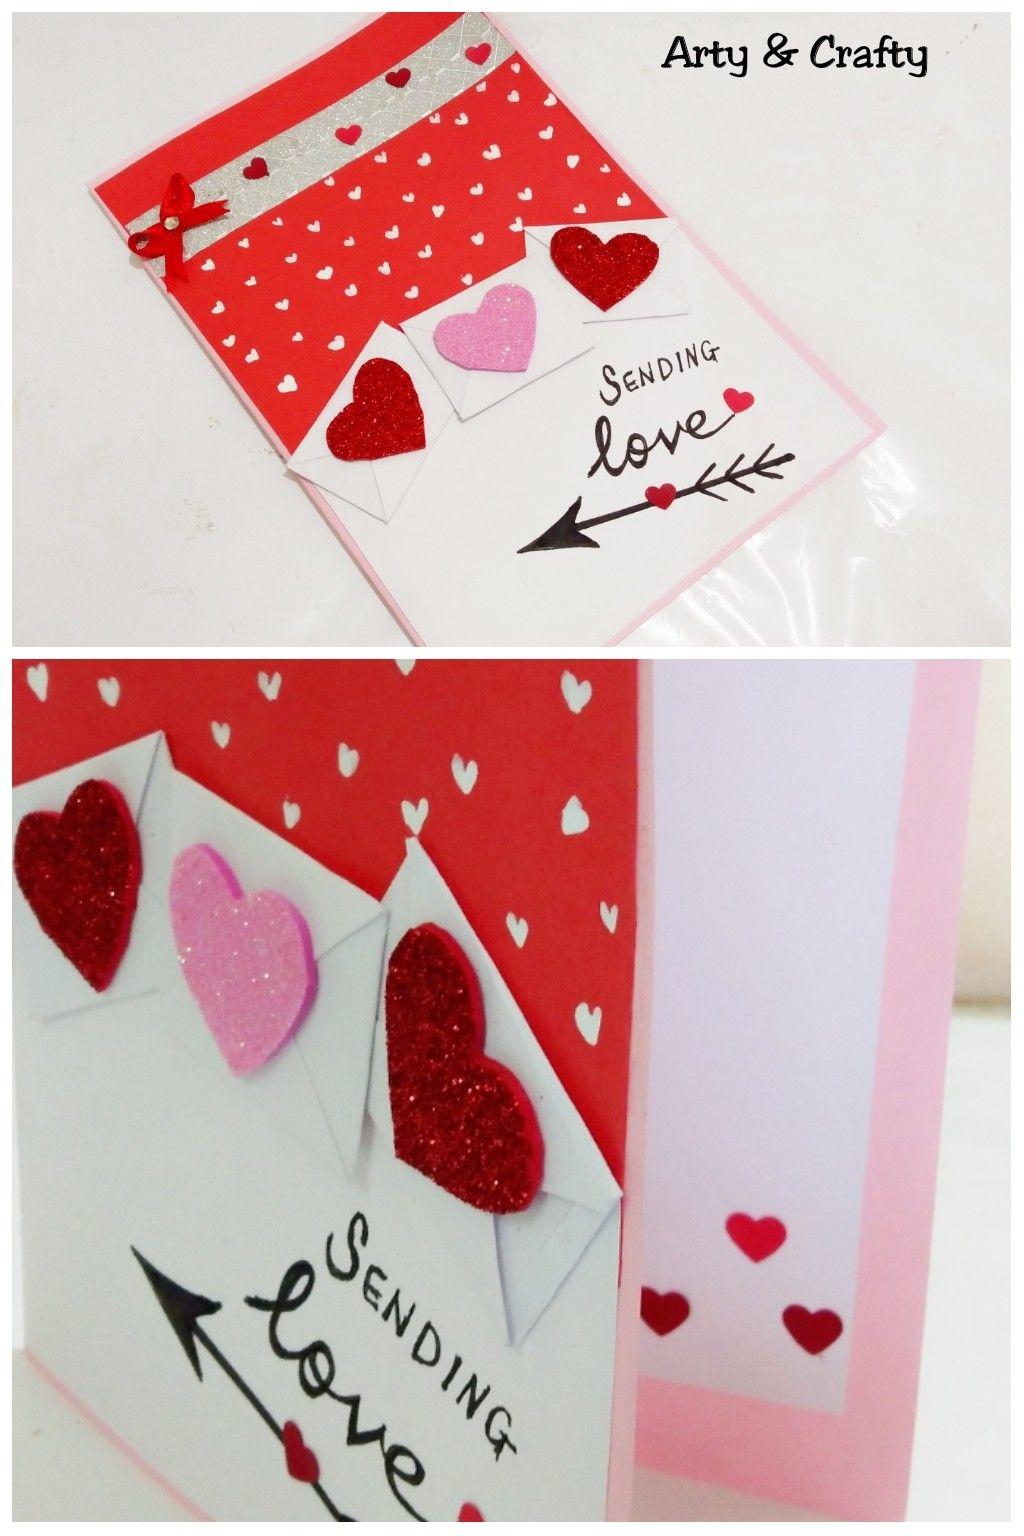 Valentine Day Card Handmade Card Ideas Anniversary Card Easy Card For Boyfriend By Arty Crafty Simple Cards Cards Handmade Anniversary Cards